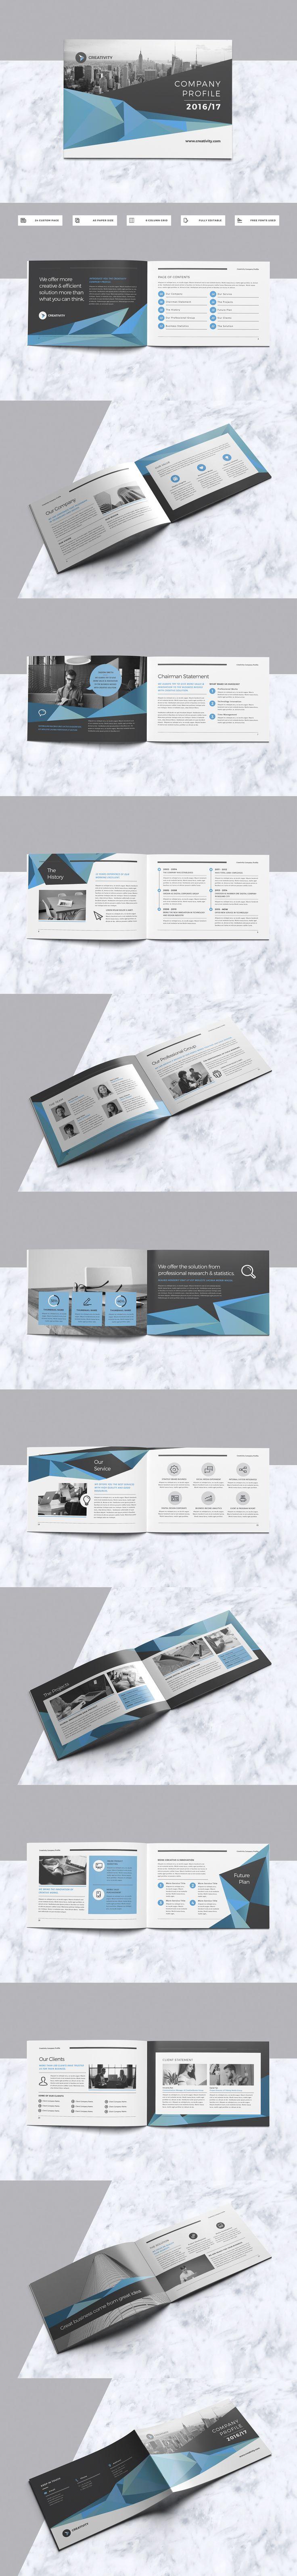 A5 Company Profile Brochure Design Template InDesign INDD